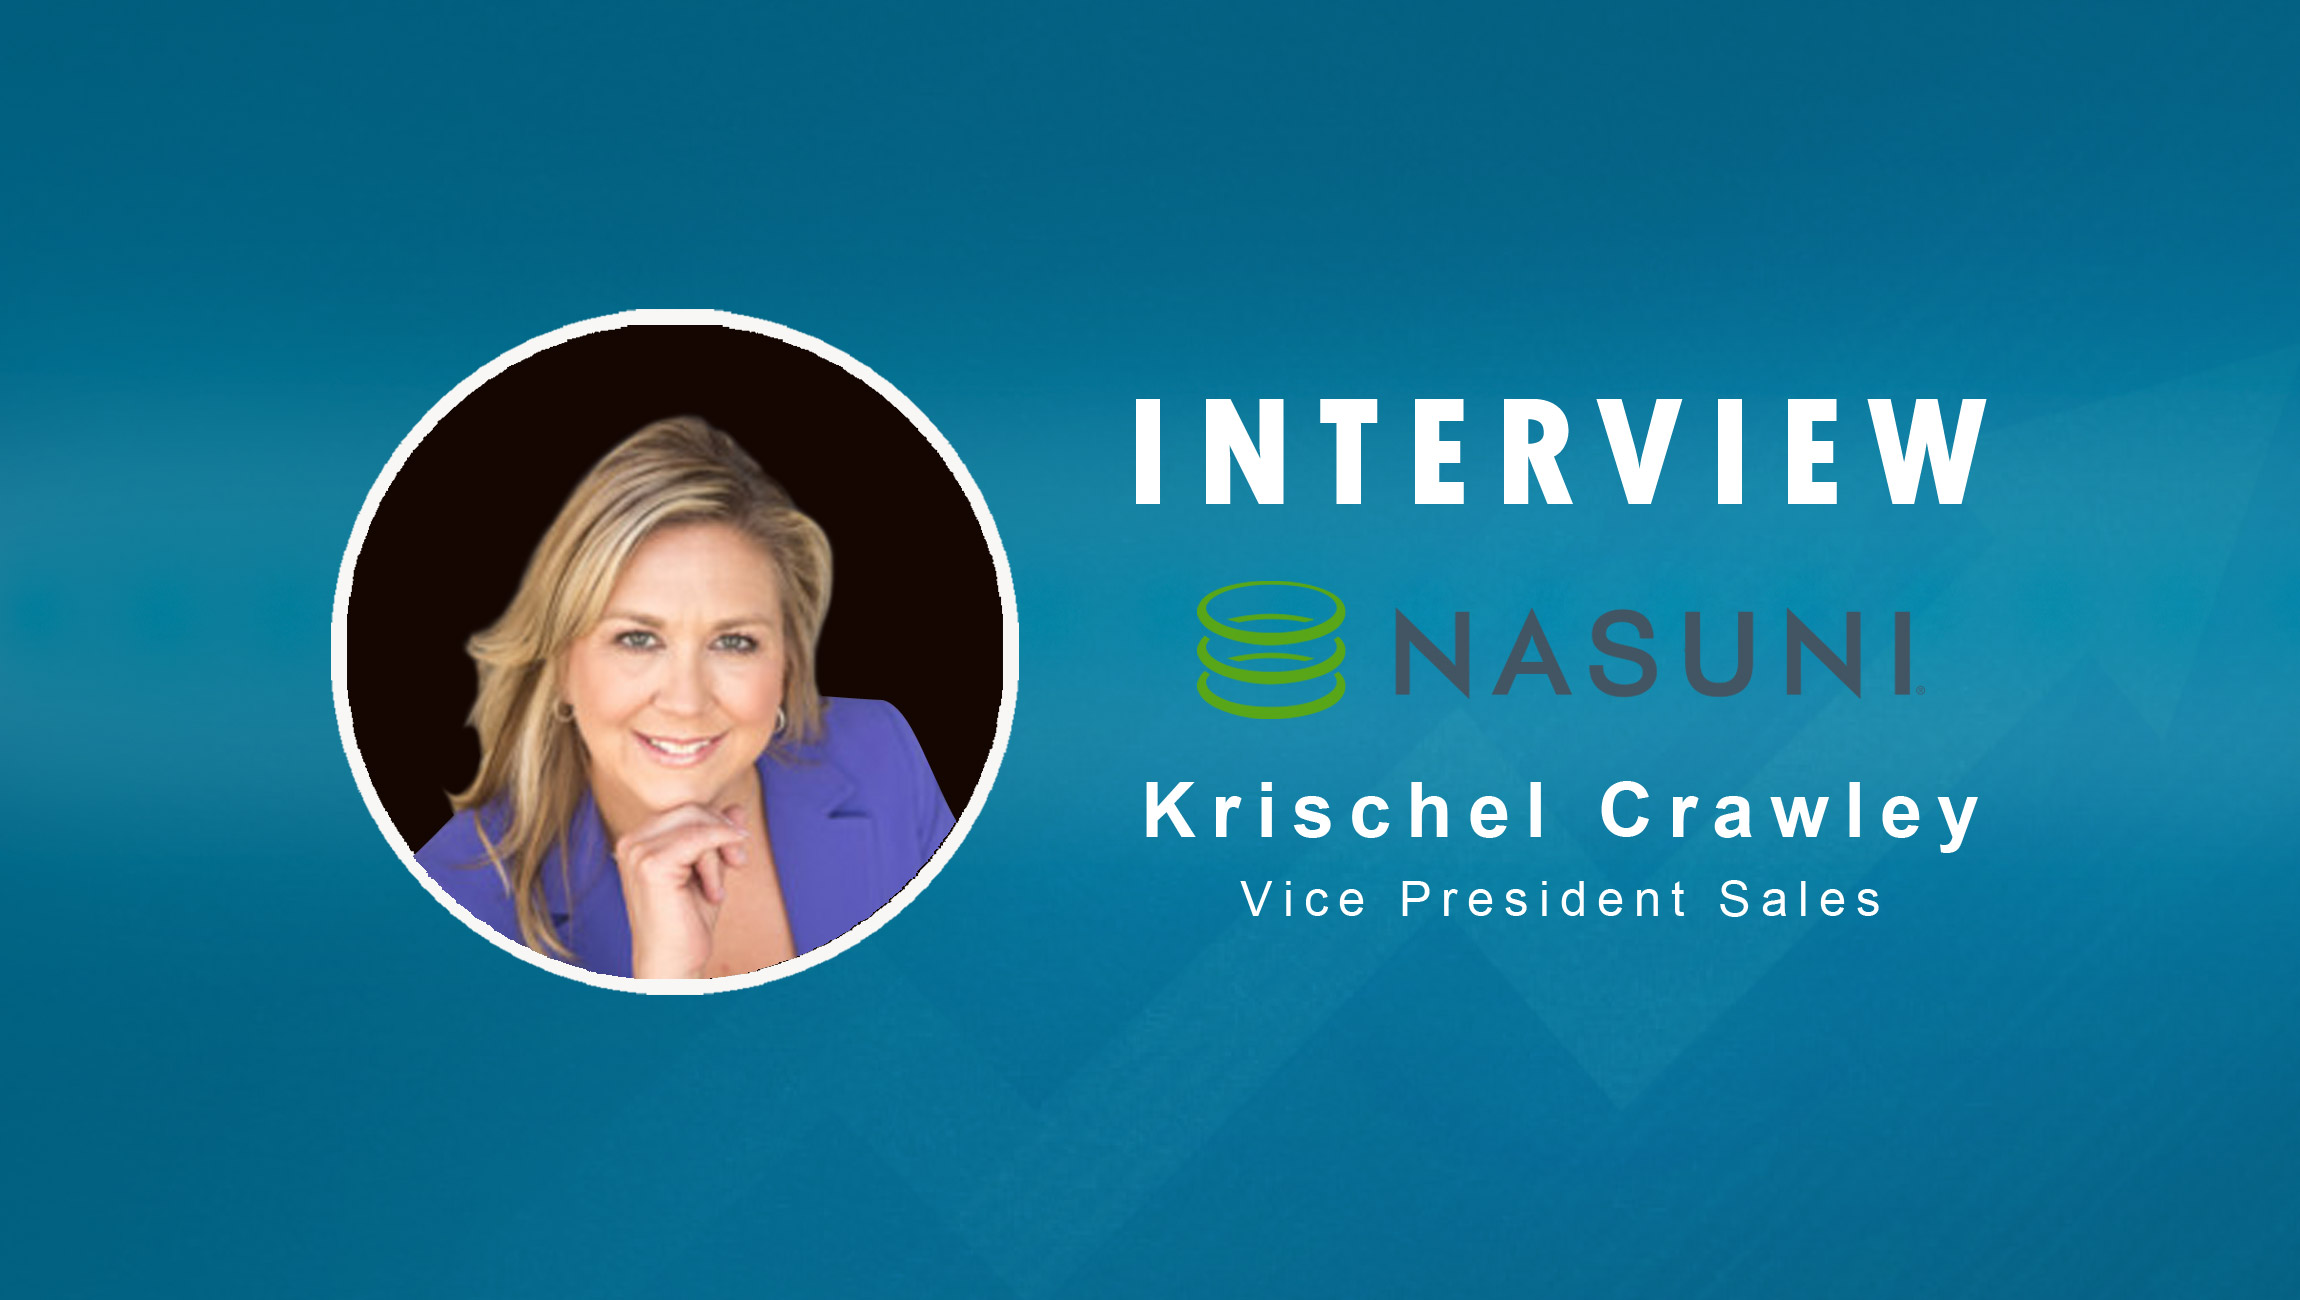 SalesTechStar Interview With Krischel Crawley, Vice President of Sales At Nasuni